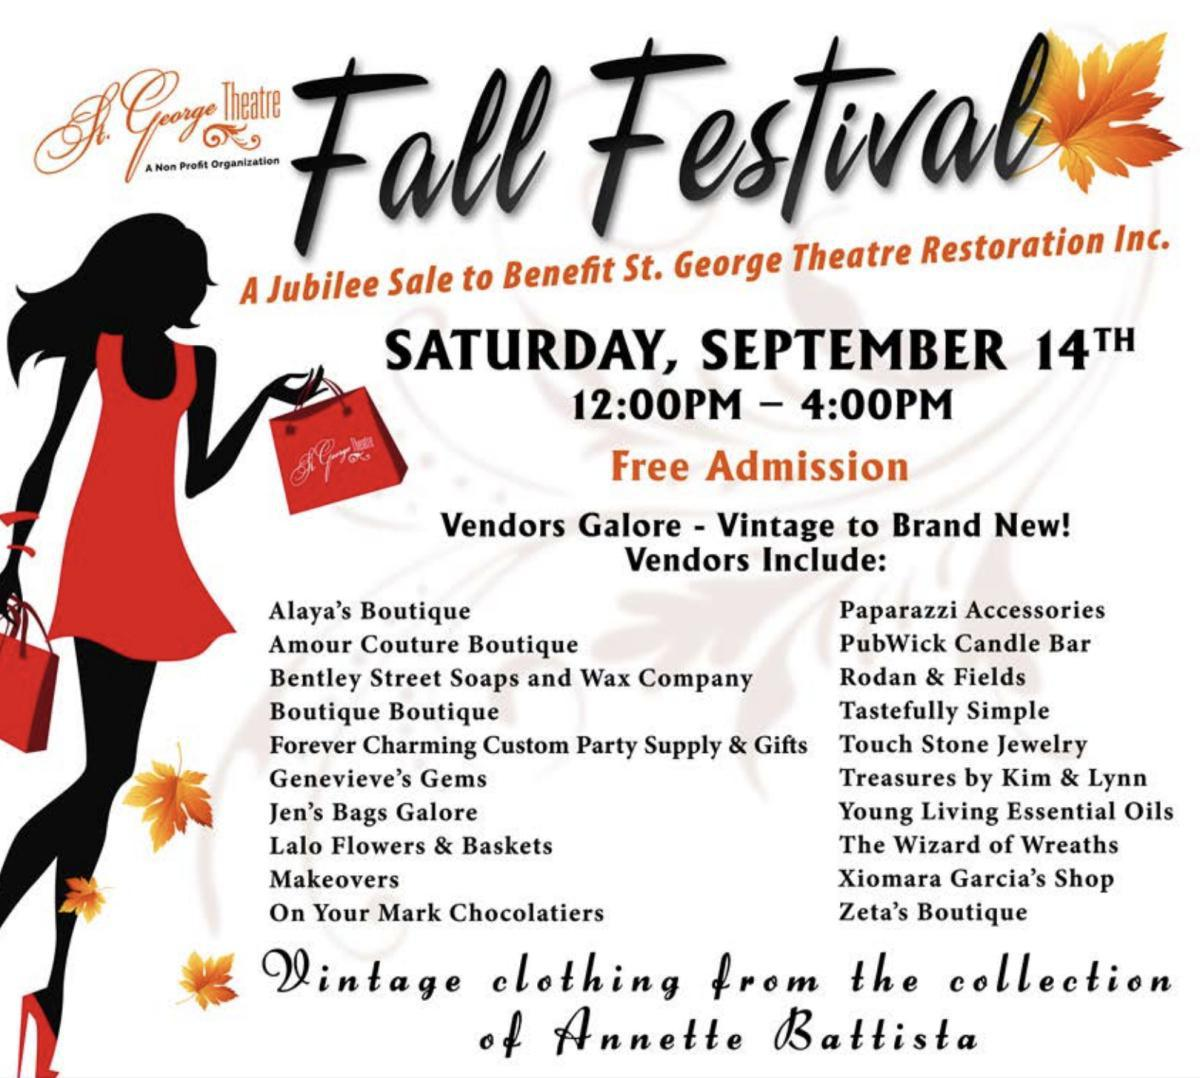 Fall Festival – Vendor Sale & More